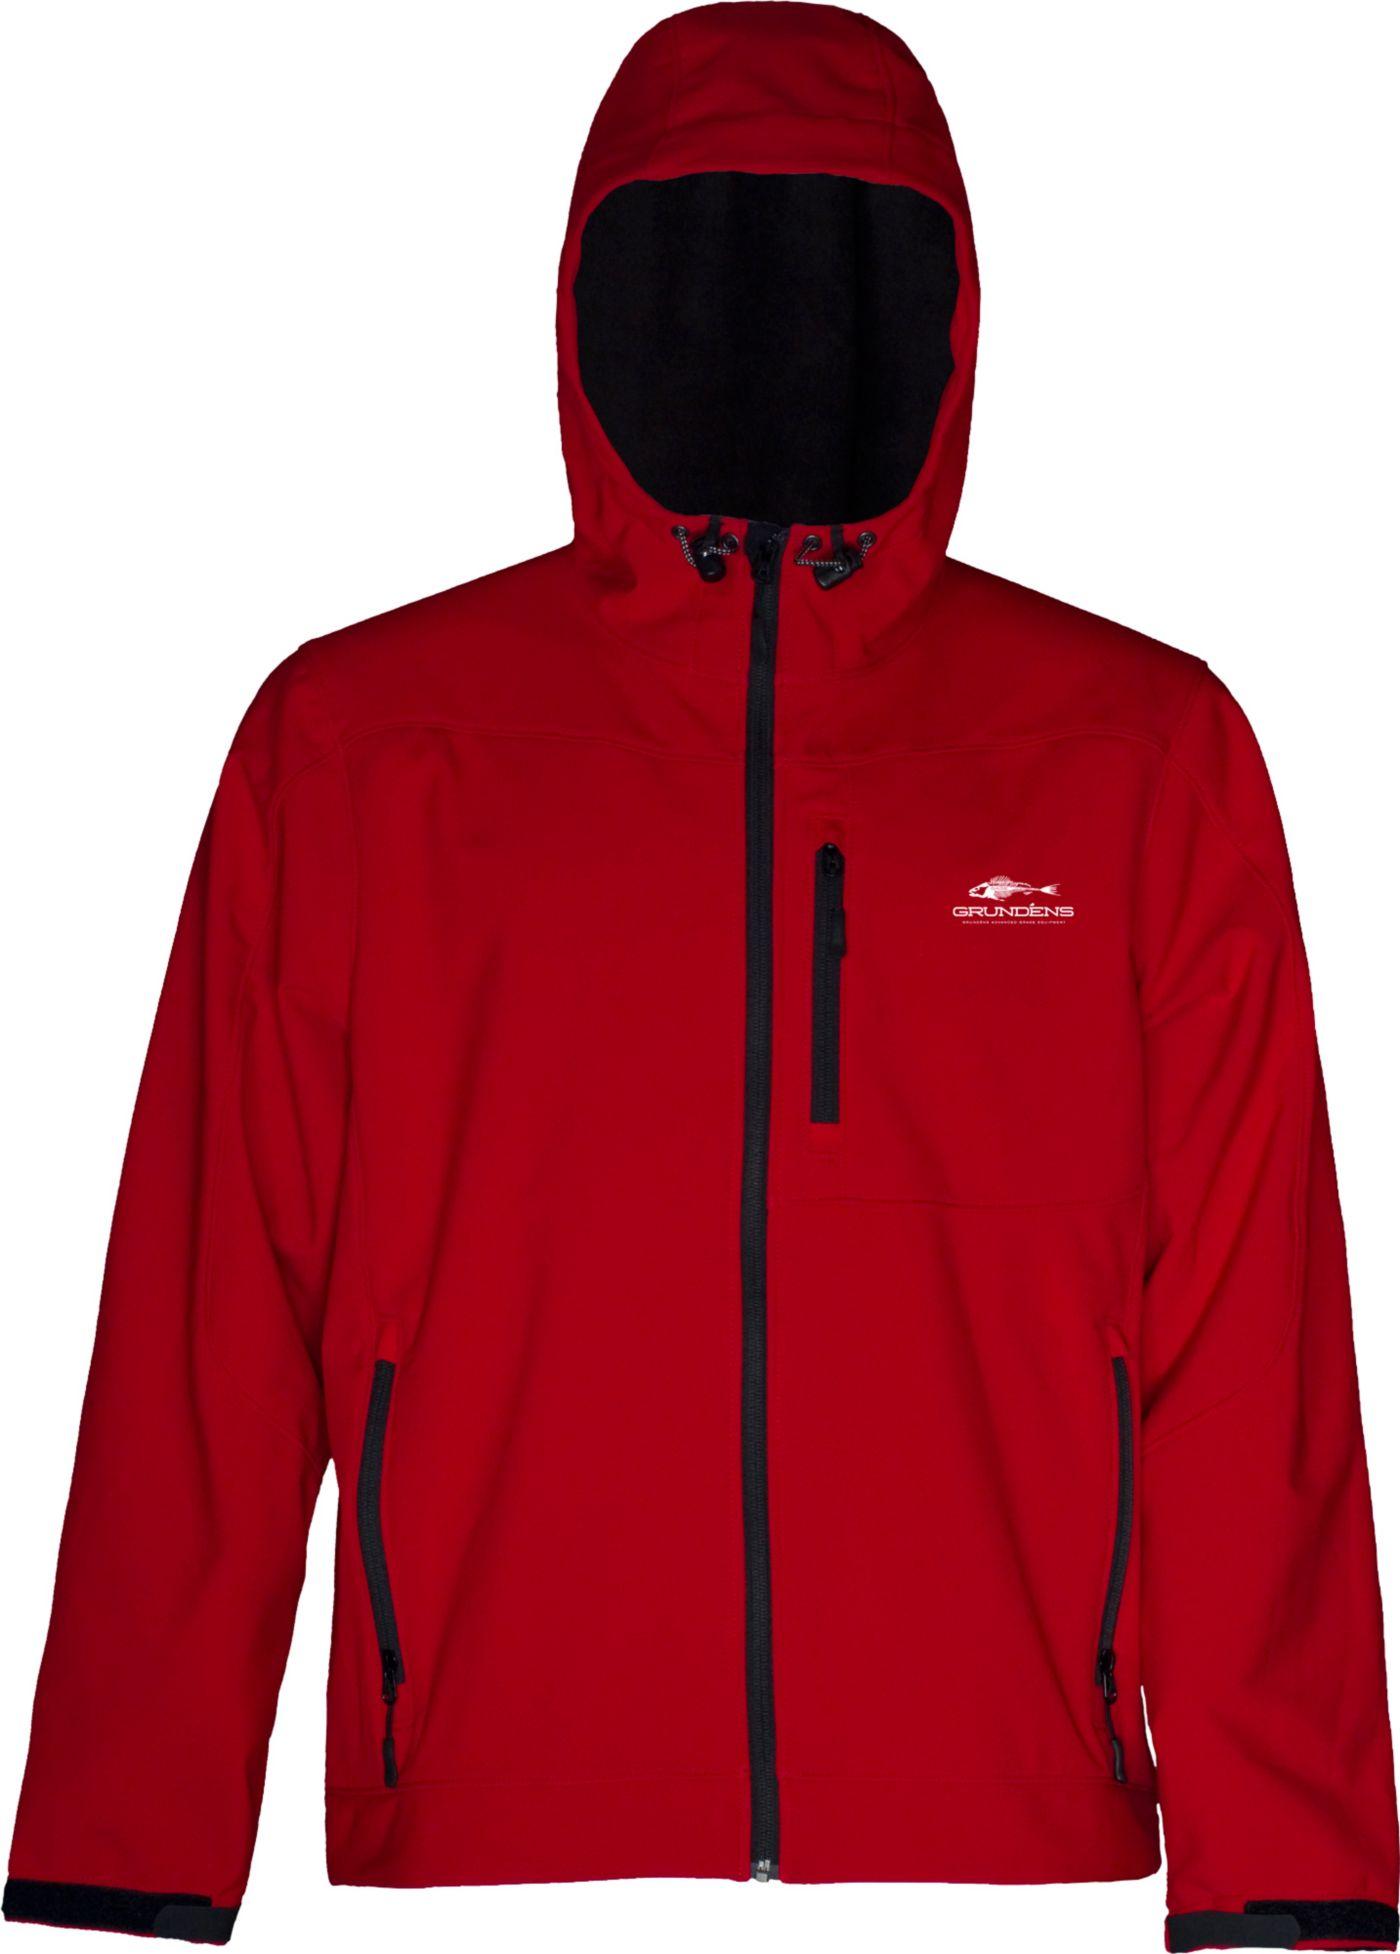 Grundéns Men's Midway Full Zip Jacket